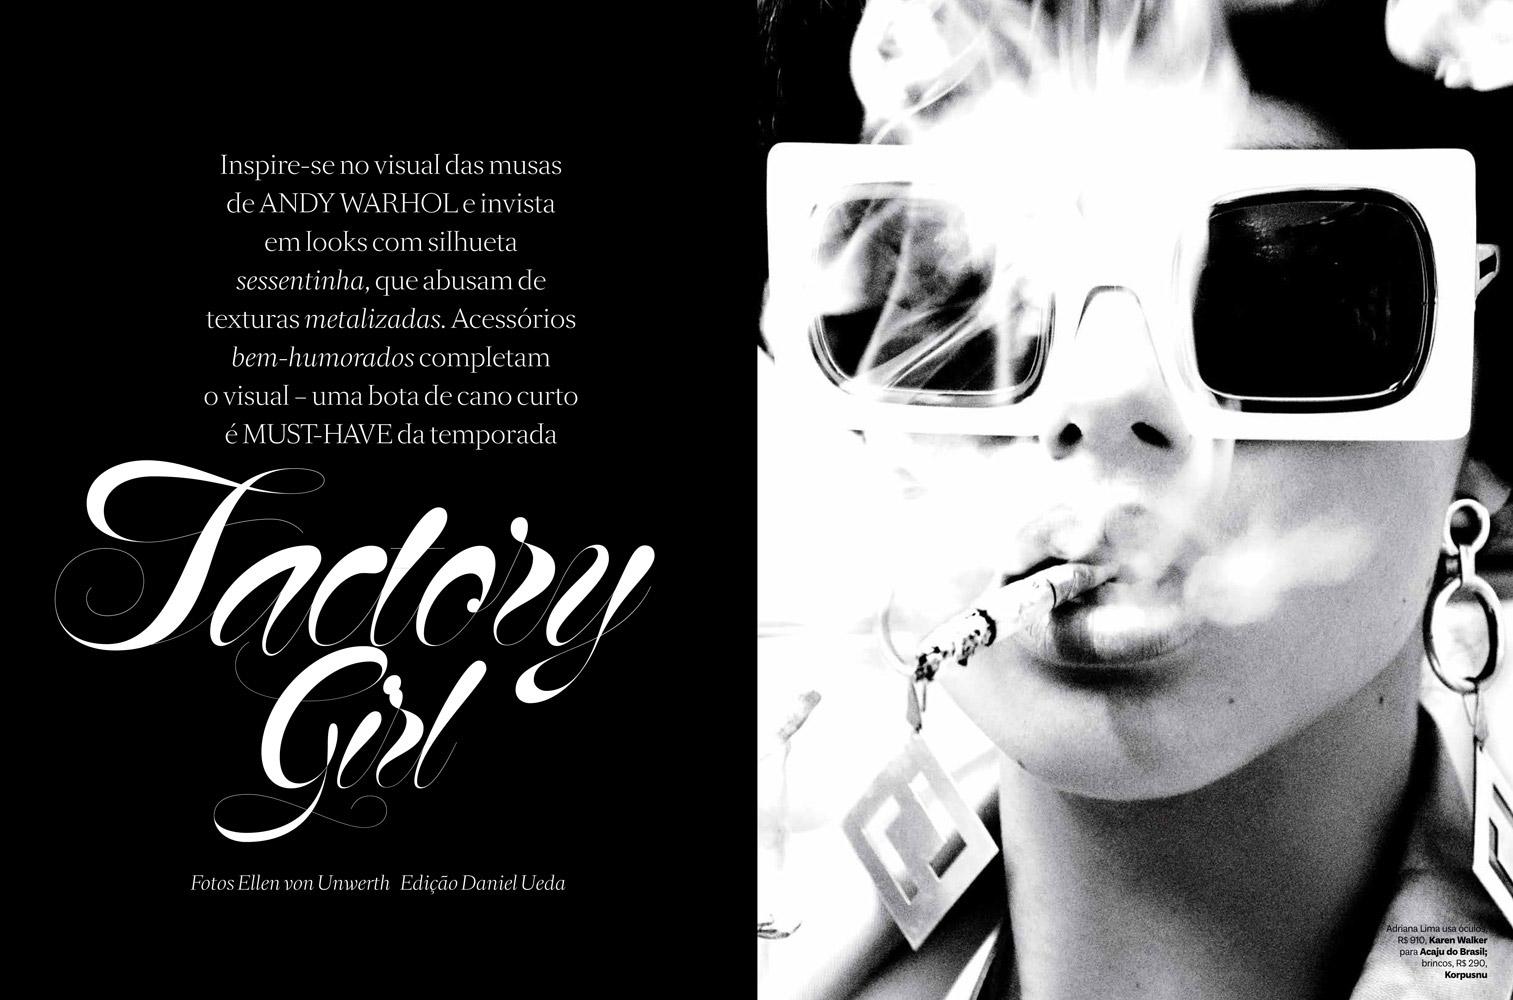 6c86d9d382205 Fashion photographer Ellen von Unwerth at 2b Management captures cover  story of Vogue Brazil s September 2014 issue starring supermodel Adriana  Lima.